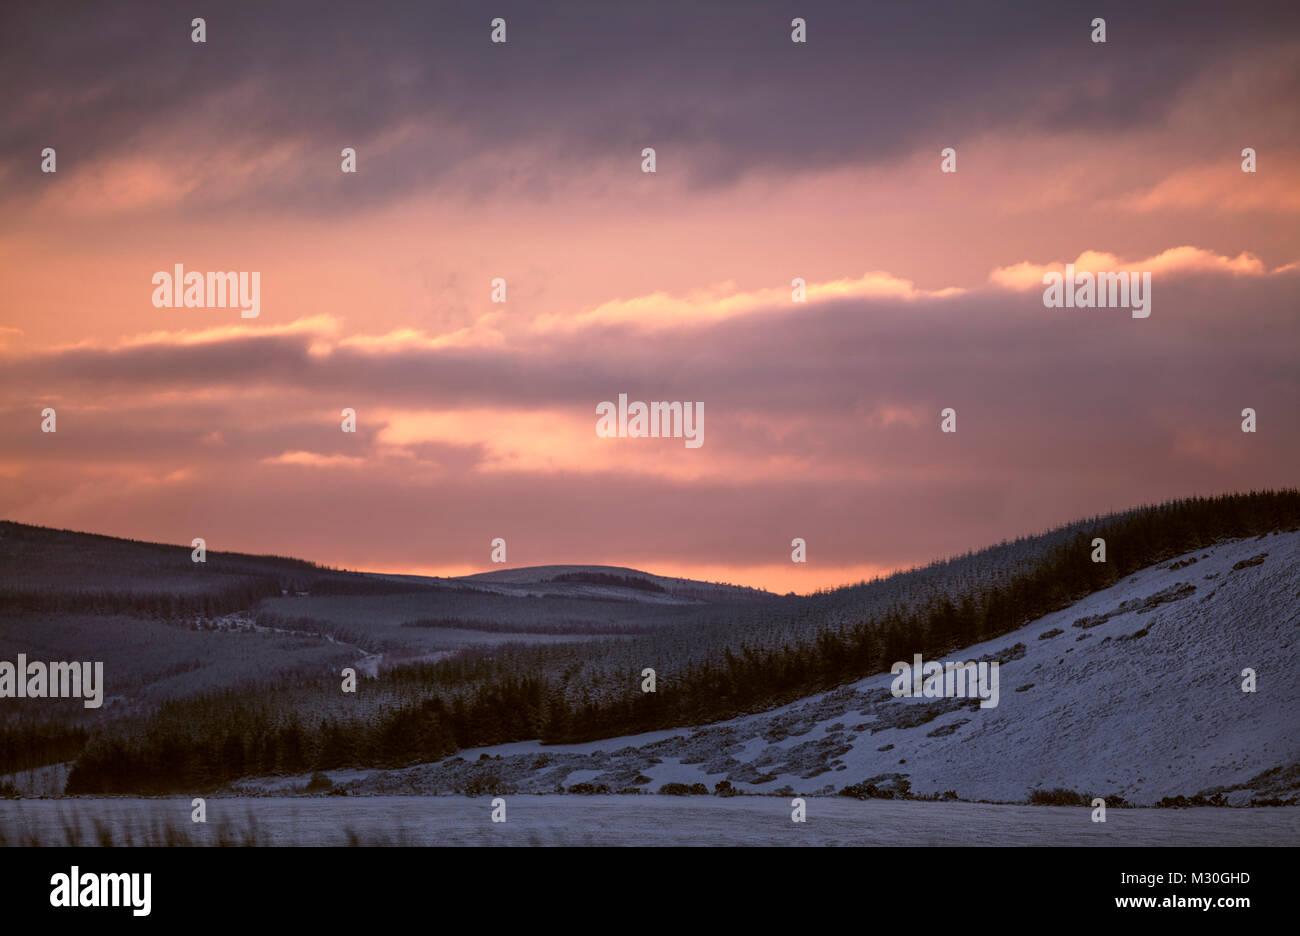 Sun rise in Scotland over hills - Stock Image